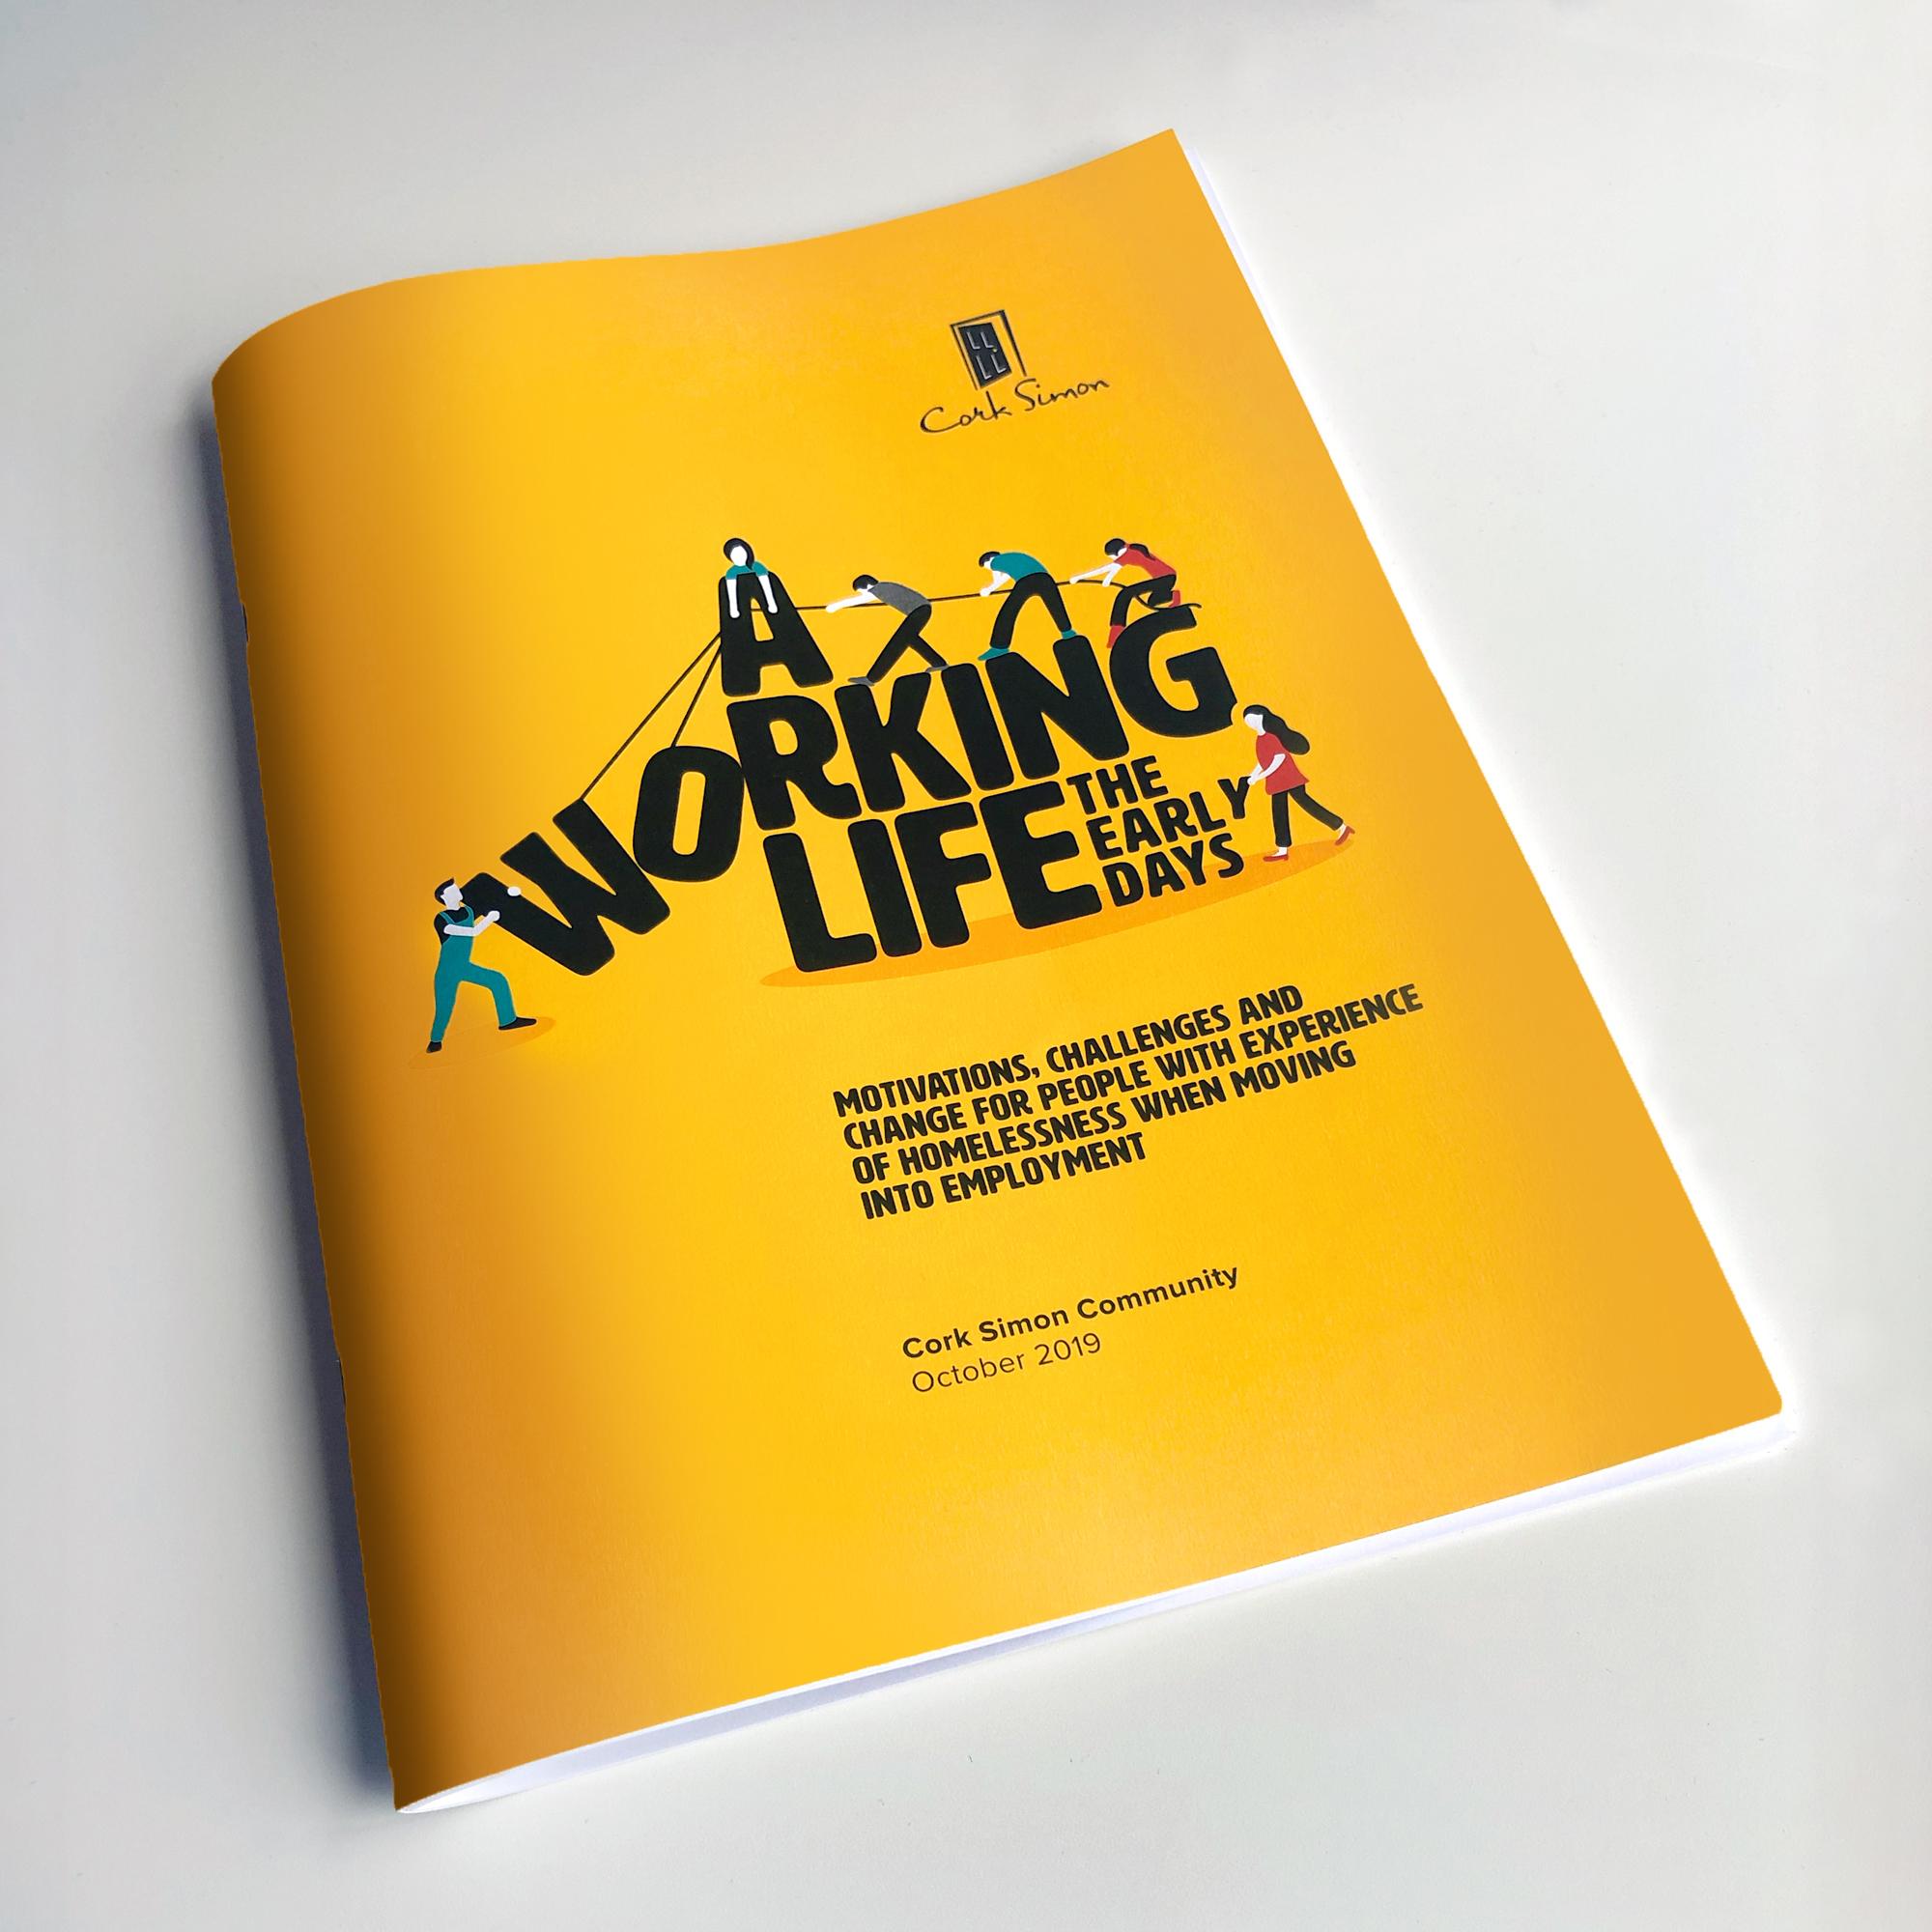 A Working Life -  Cork Simon Community